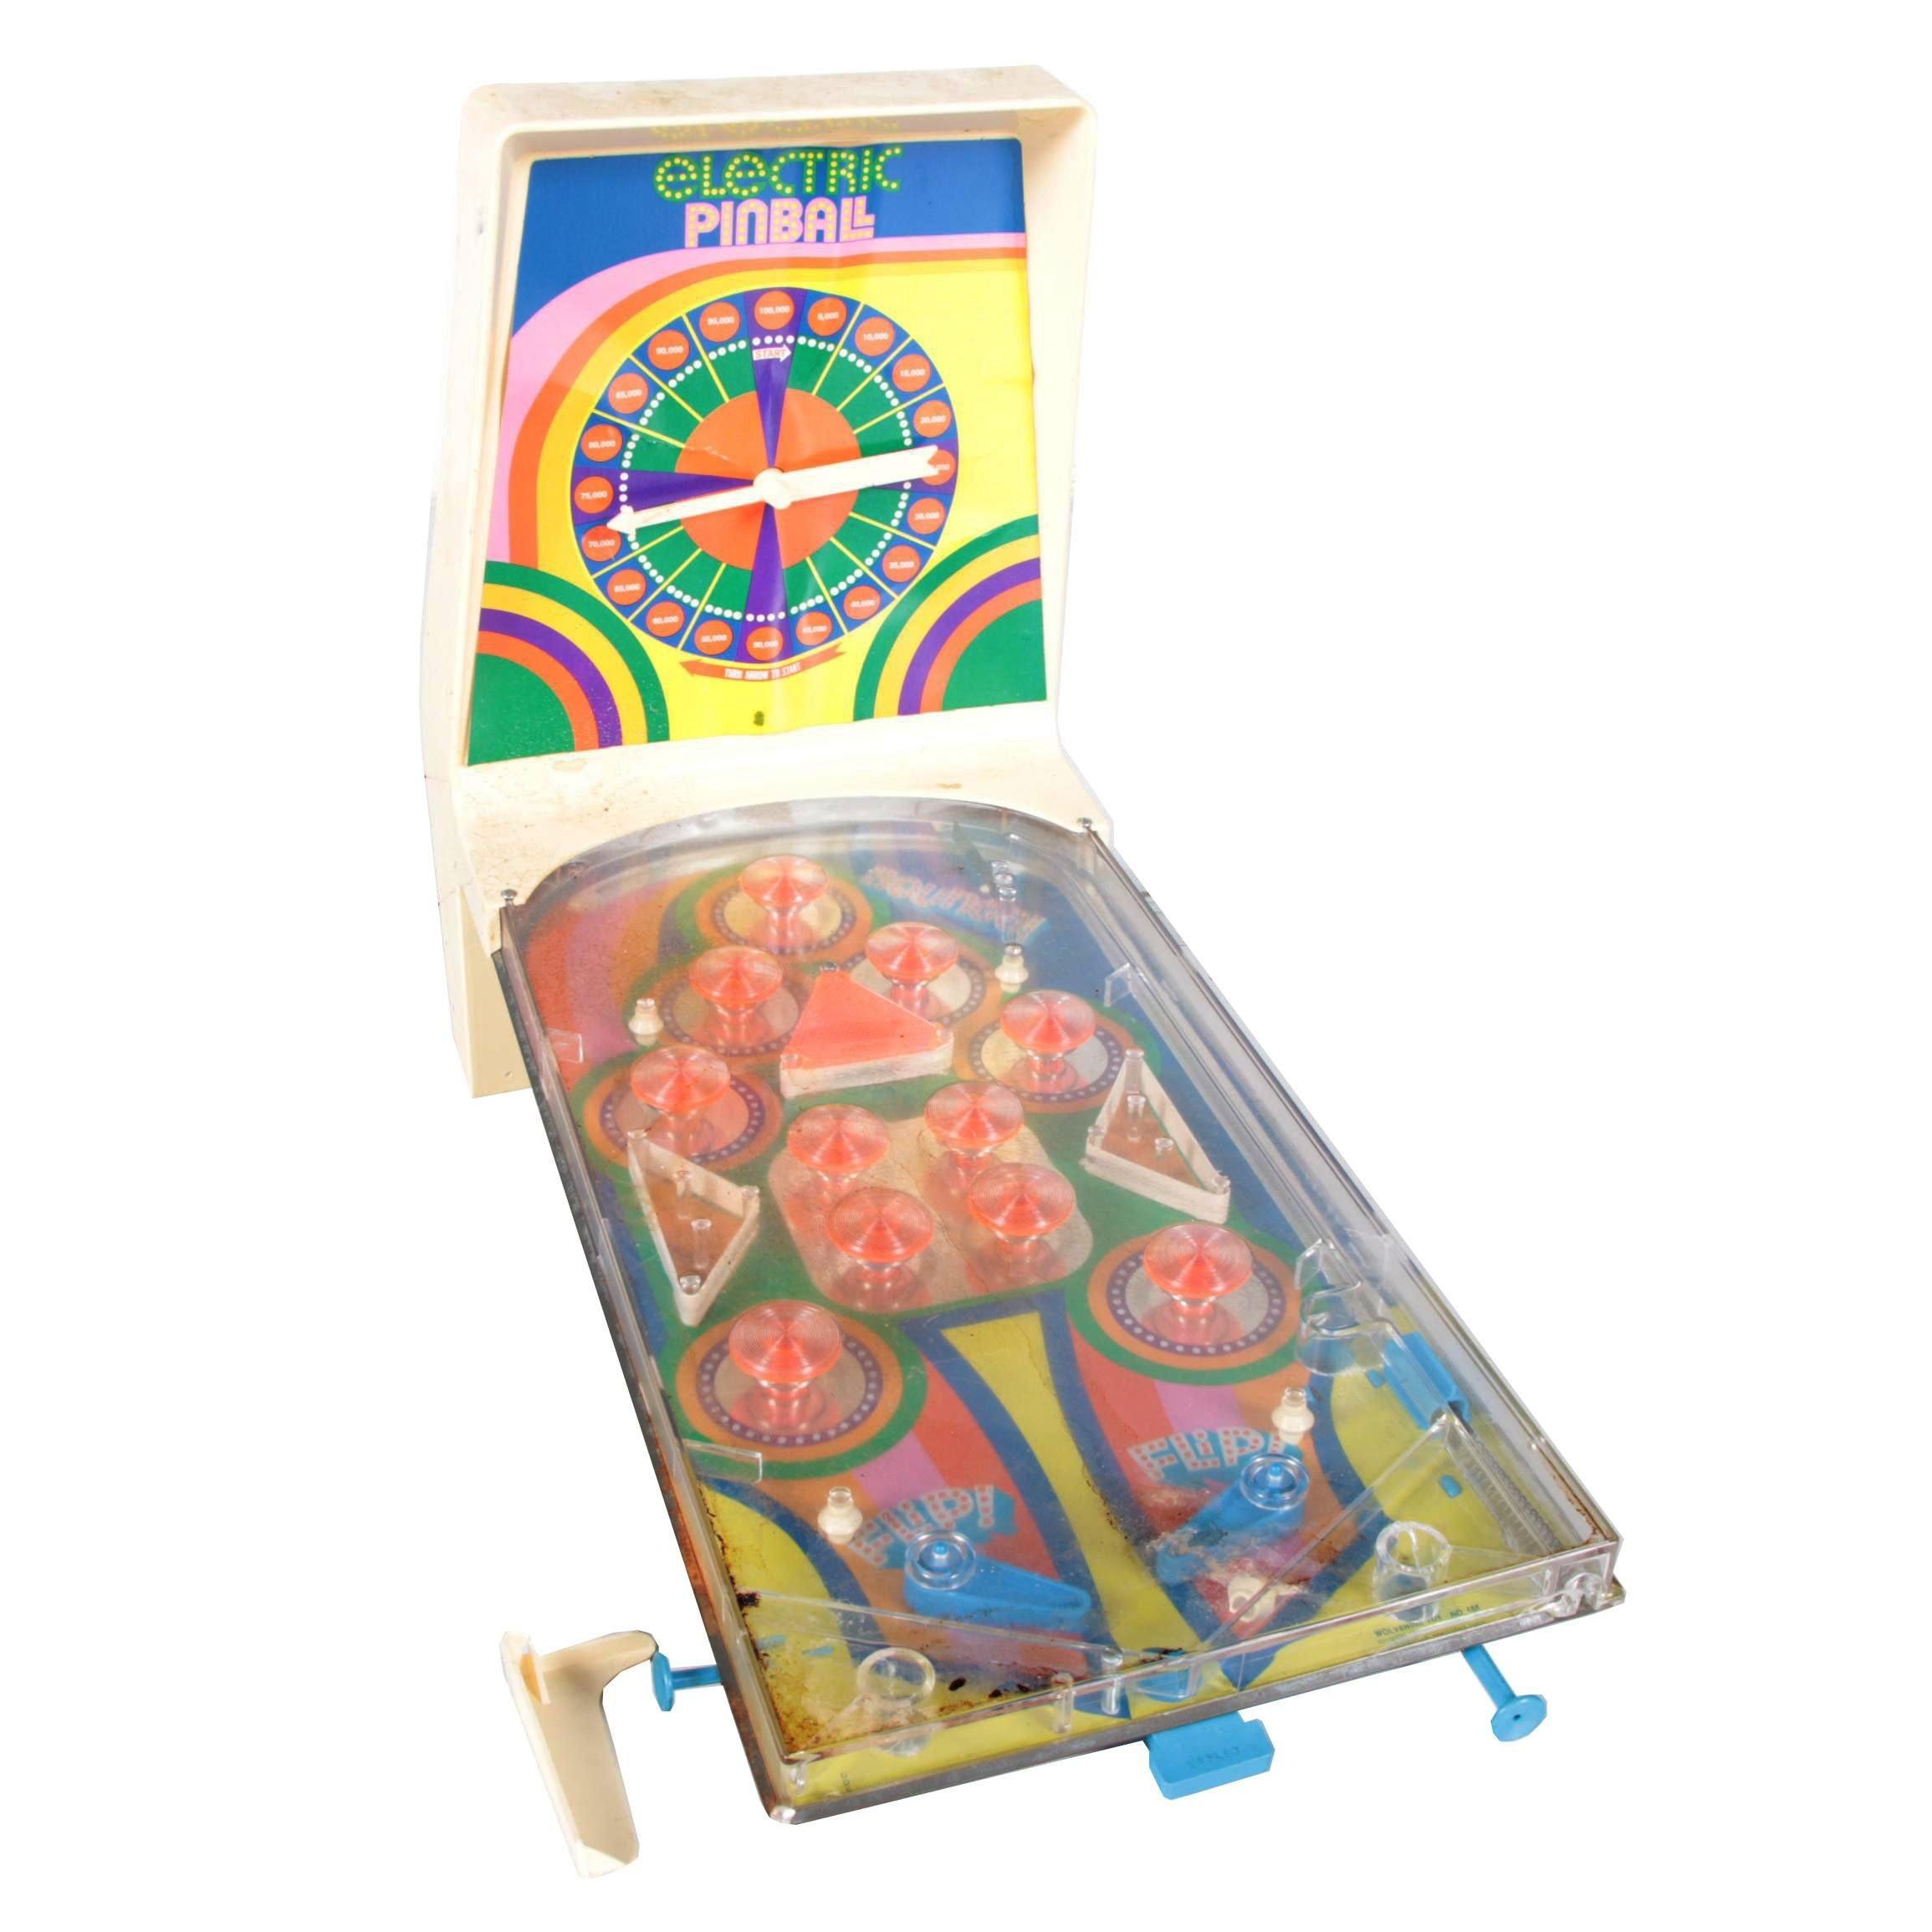 Electric Tabletop Pinball Machine